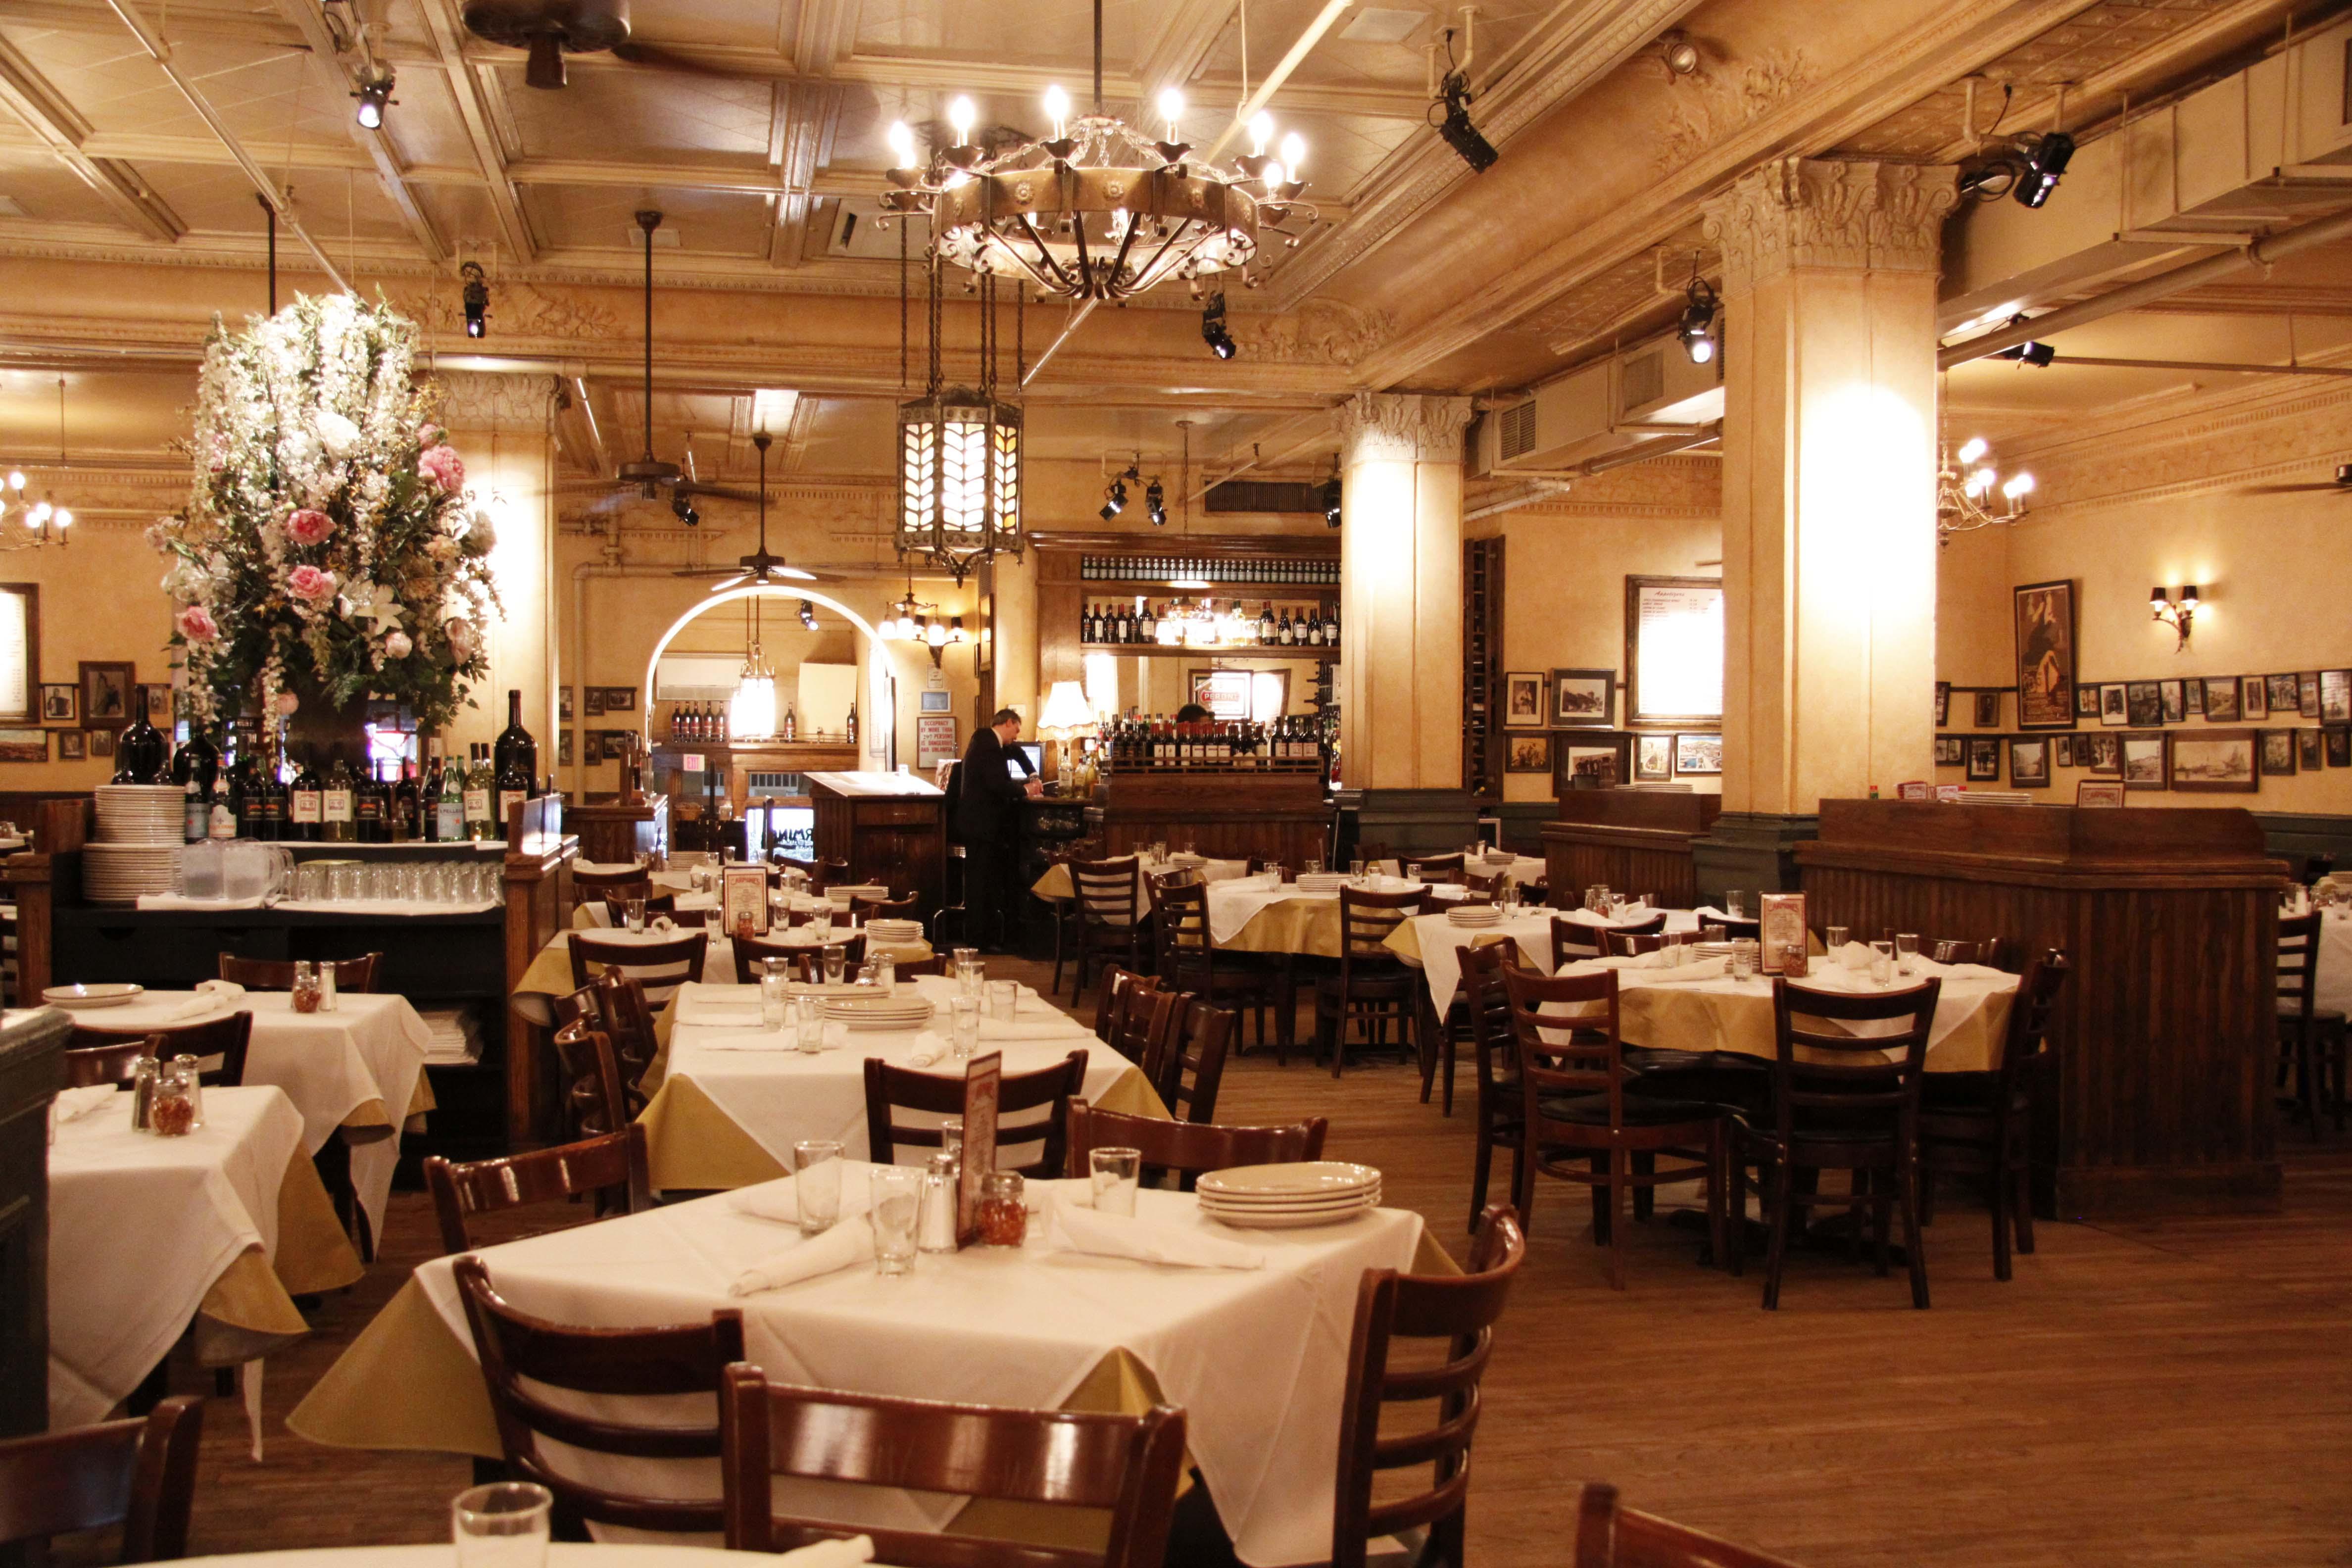 Big Italian Restaurants Near Me: 6 NYC Restaurants To Match Your Mood